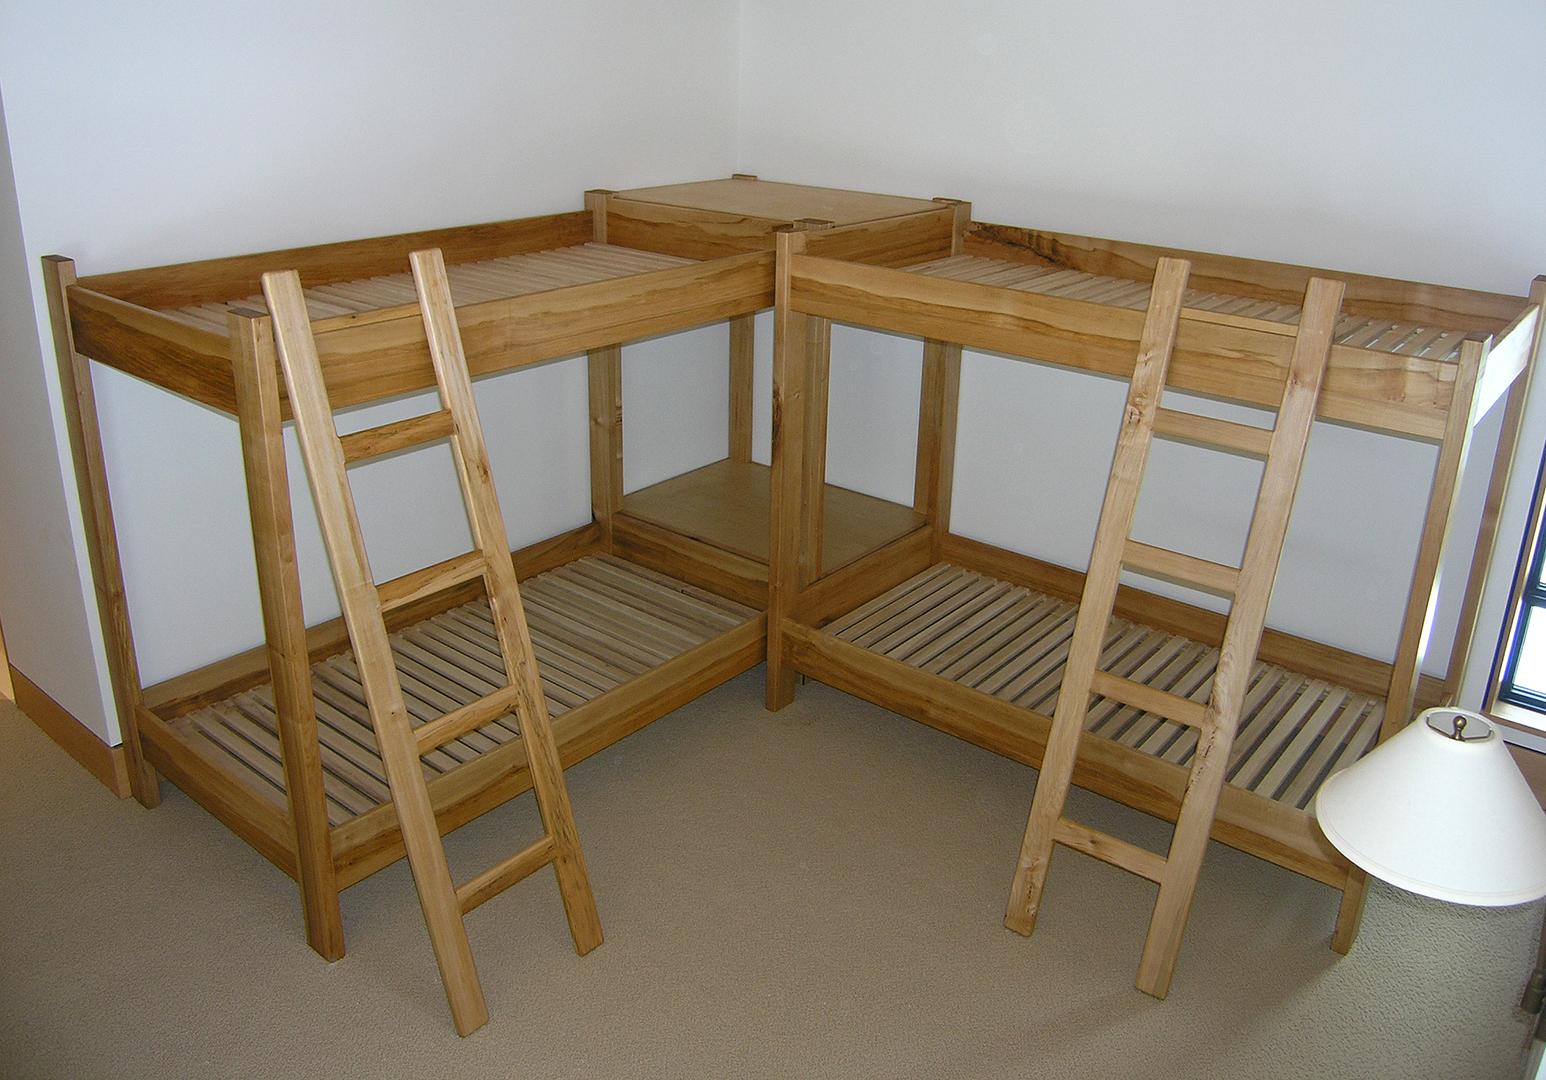 Mapleart Custom Wood Furniture Vancouver Bccrocosmia Aurea Bunk